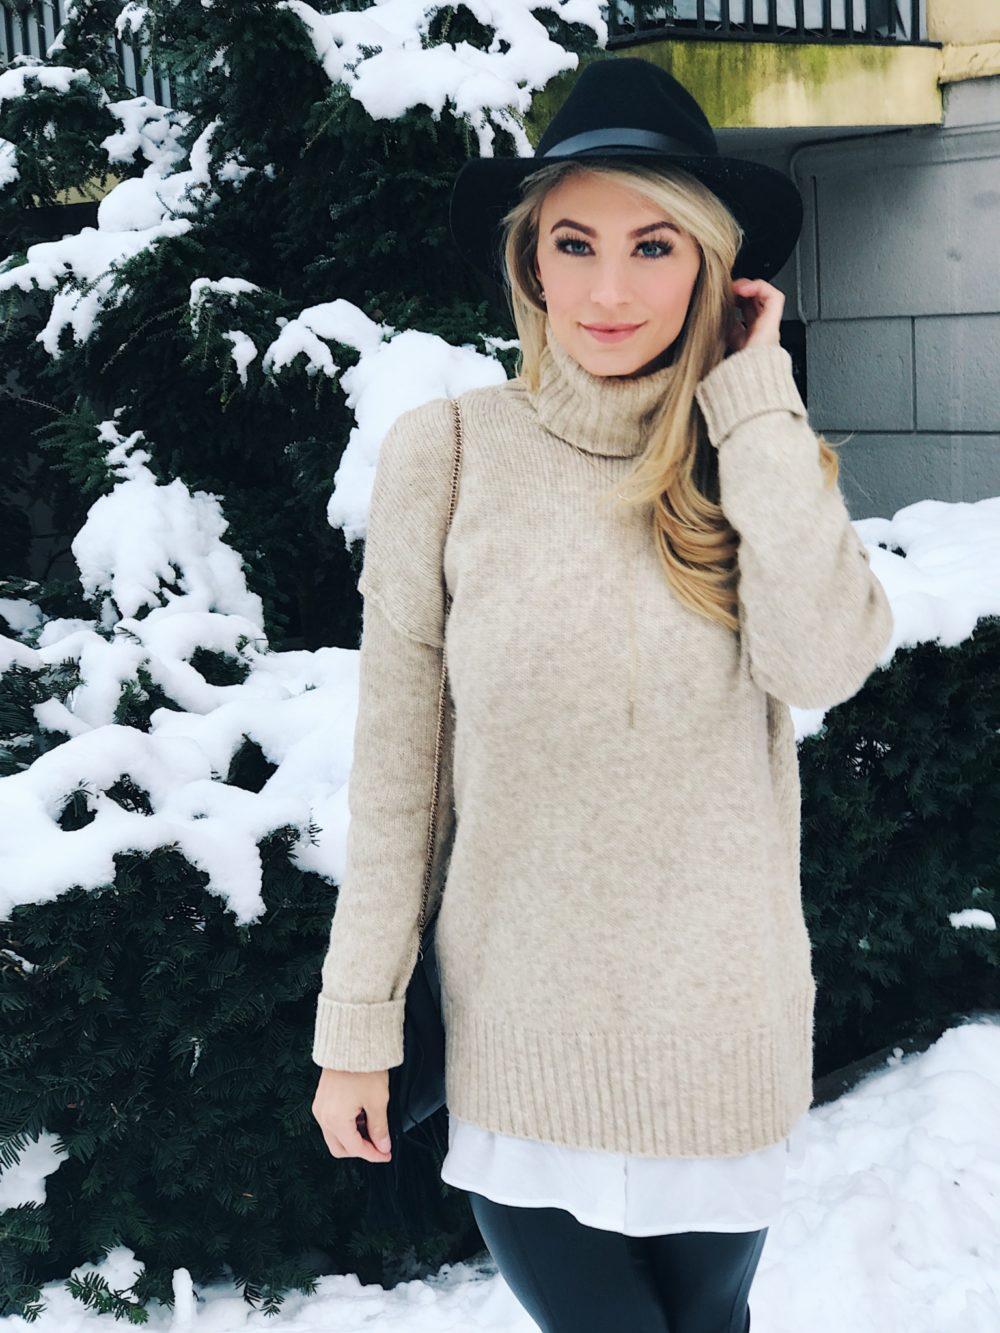 Sweater-Weather-3.jpg